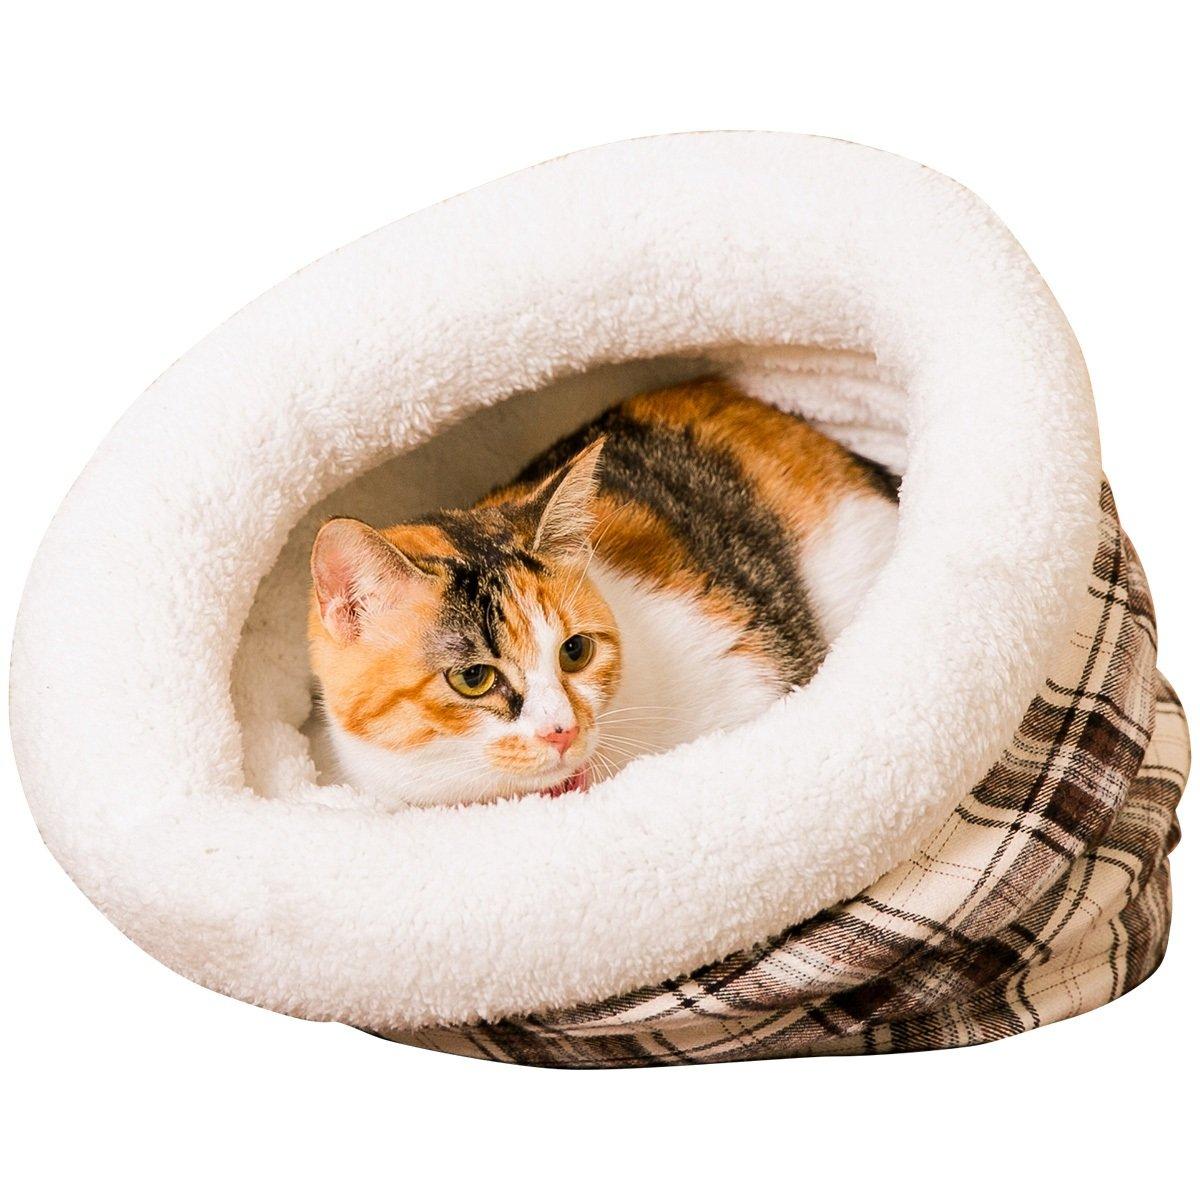 "PAWZ Road Cat Sleeping Bag Kitty Sack Bed 11.8""x15.7"""